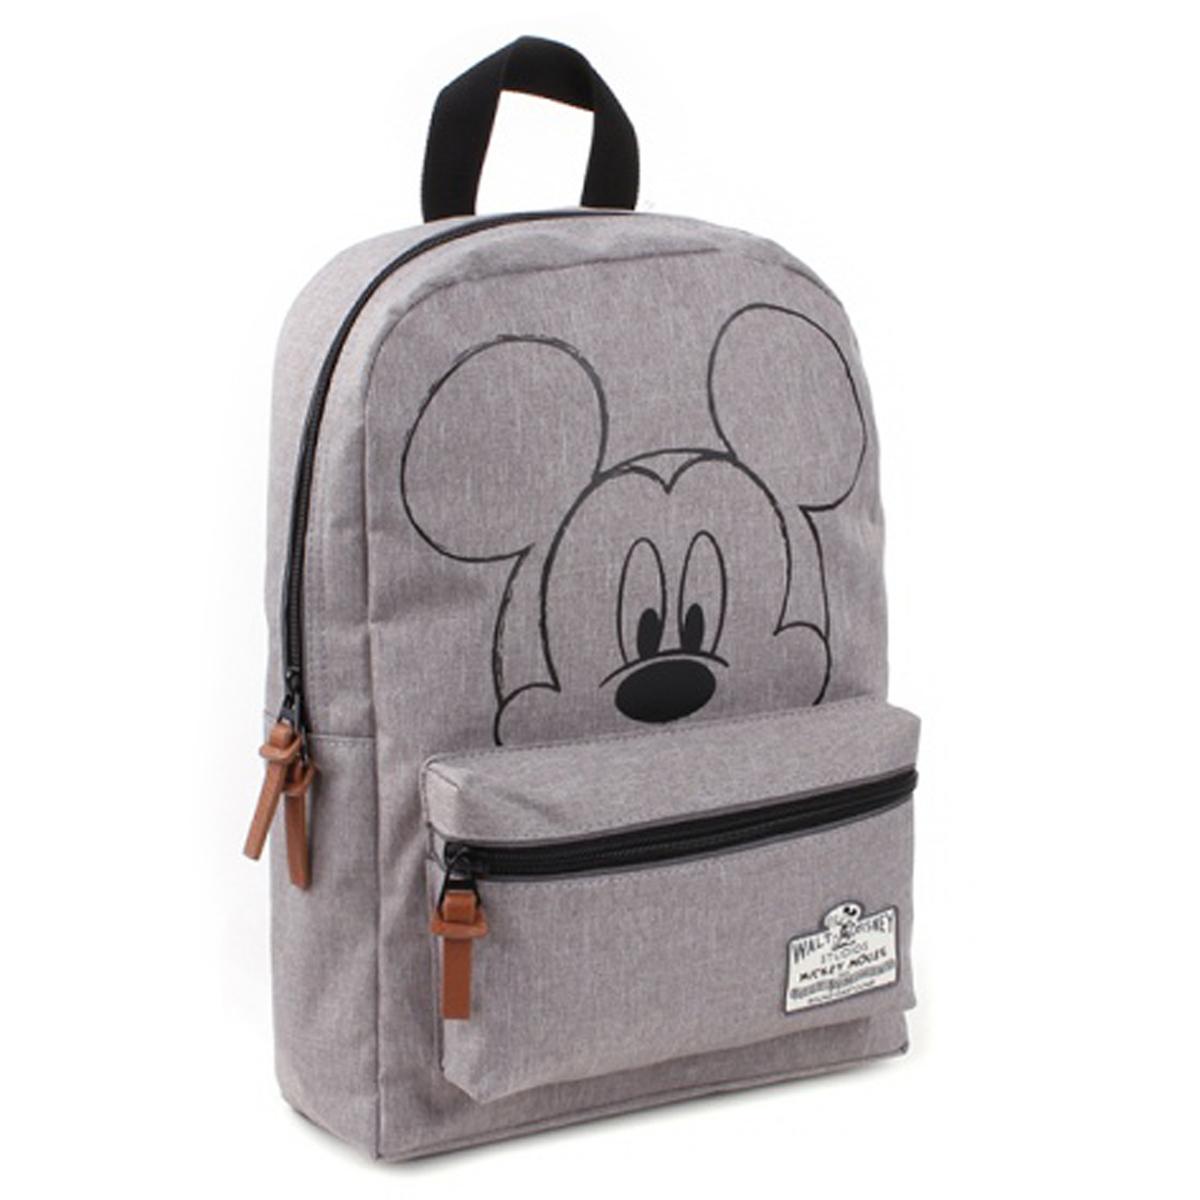 Sac à dos créateur \'Mickey\' gris - 33x23x12 cm (90th Anniversary ) - [Q3477]